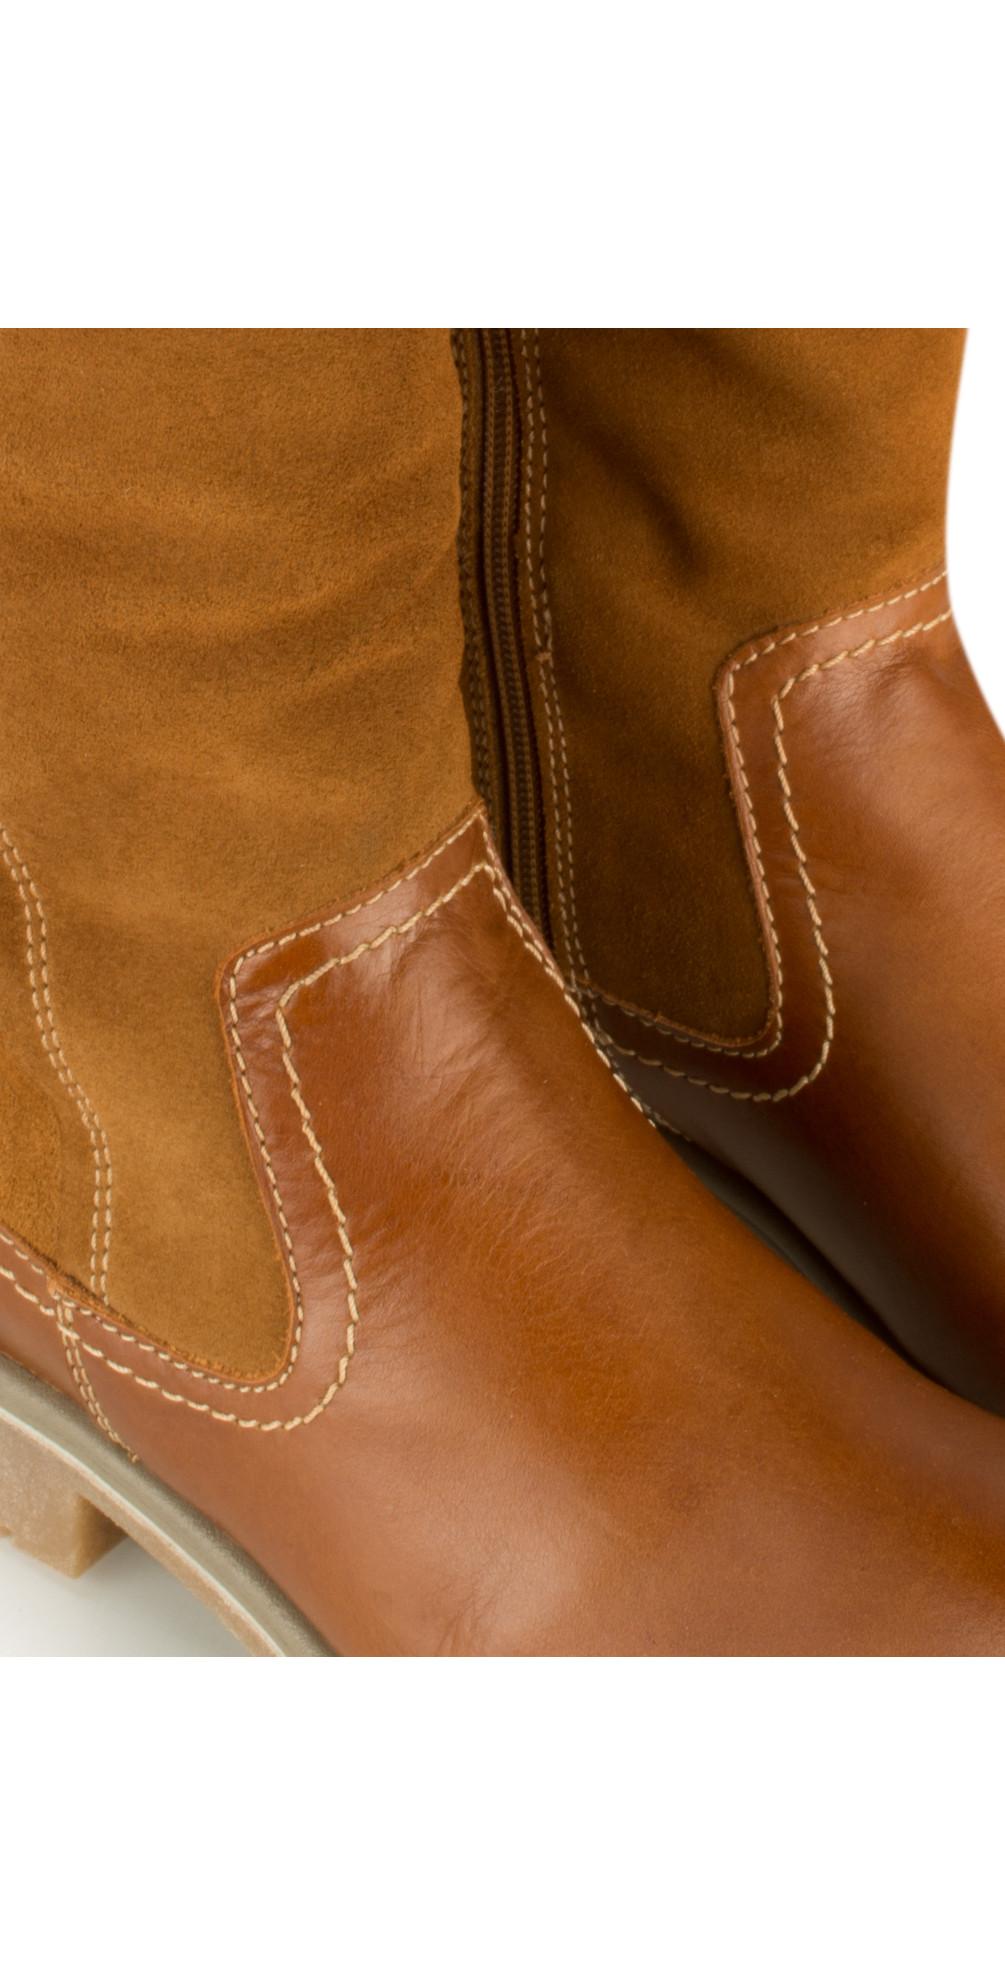 Leather Sympatex Long Boot main image